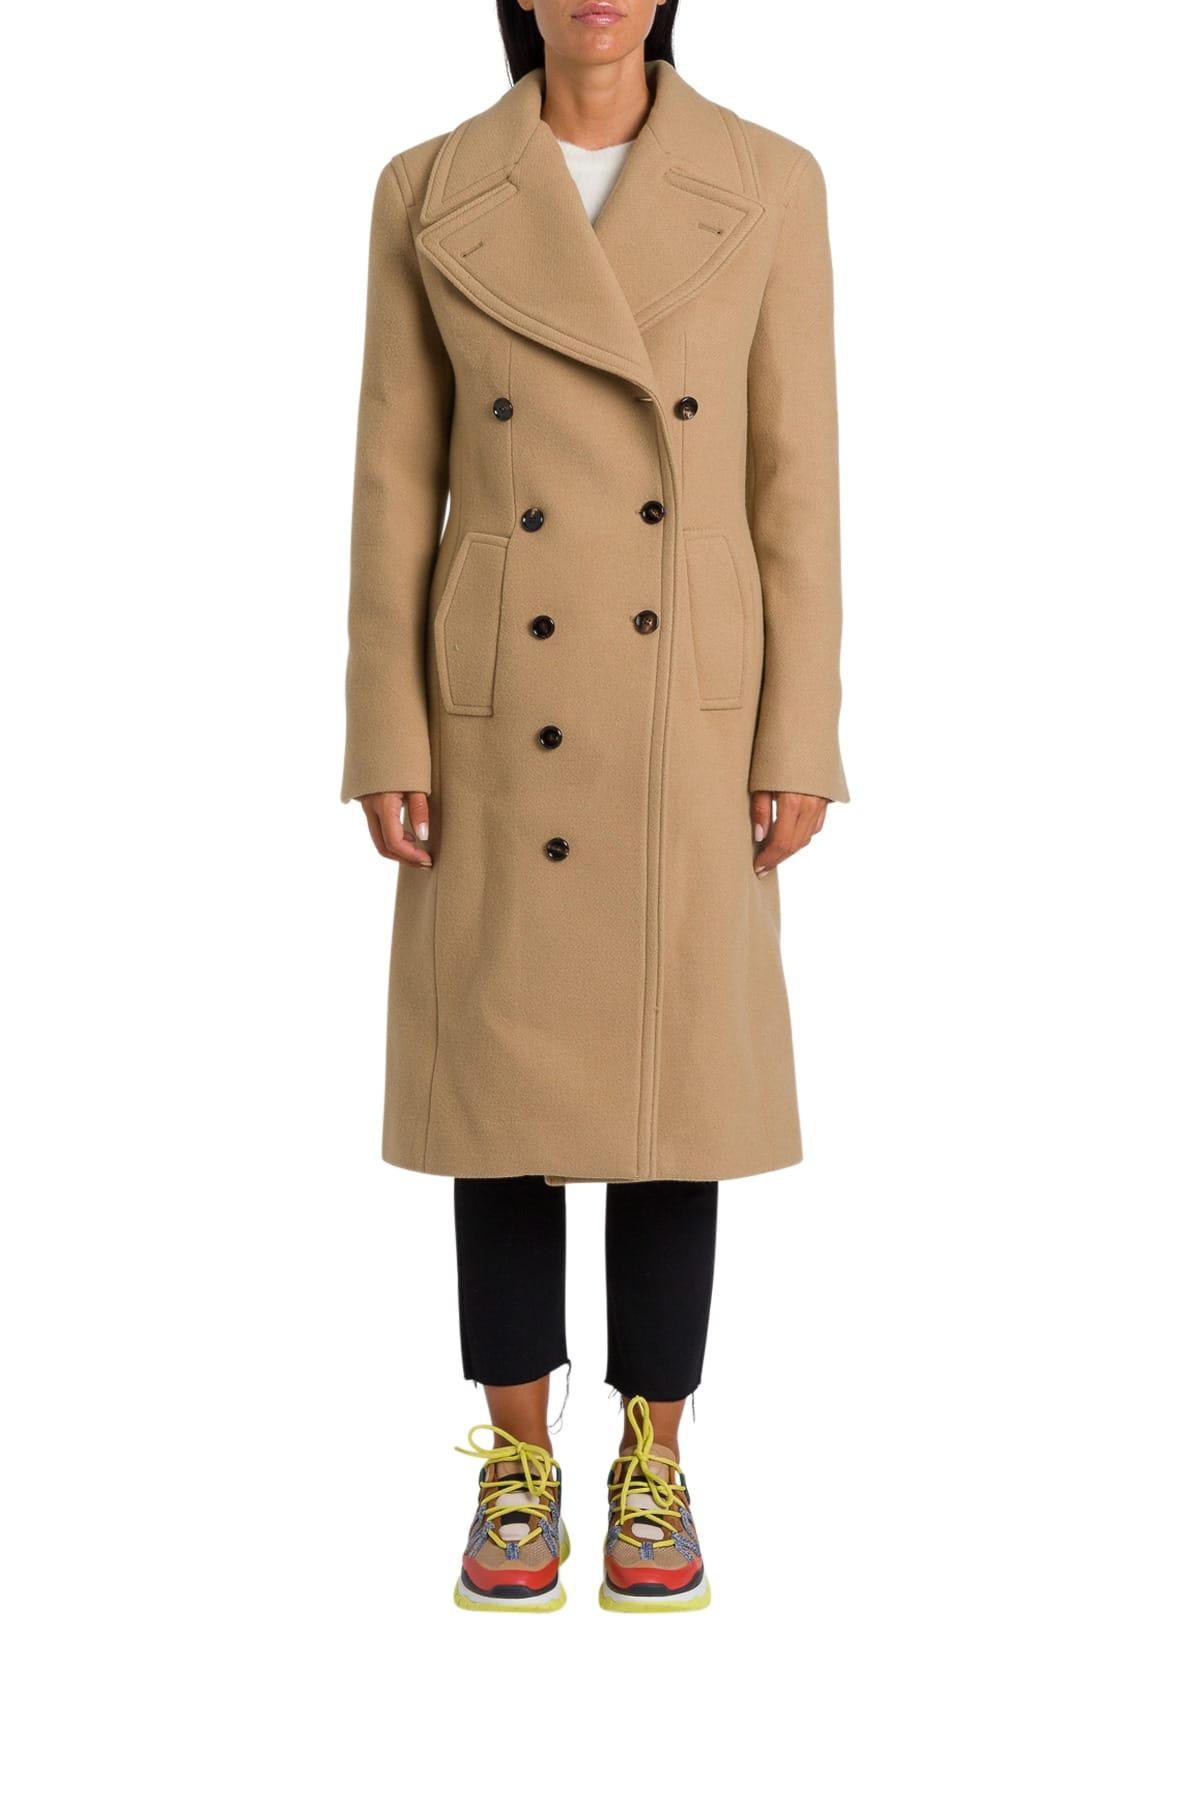 Chloé Asymmetric Double-breatsed Coat